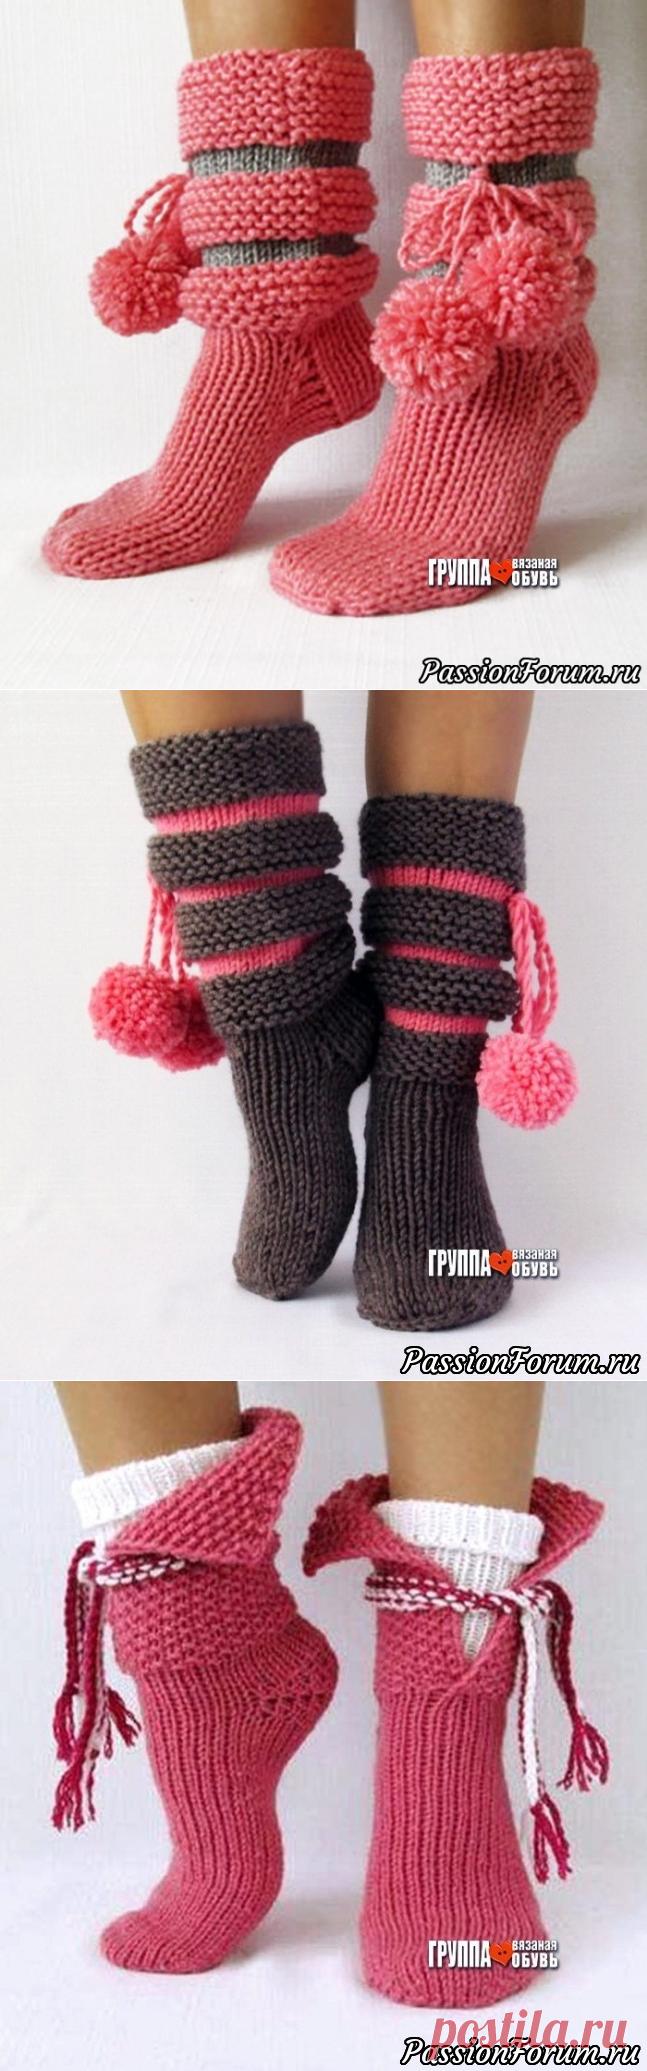 Socks spokes. Very much ideas were pleasant!